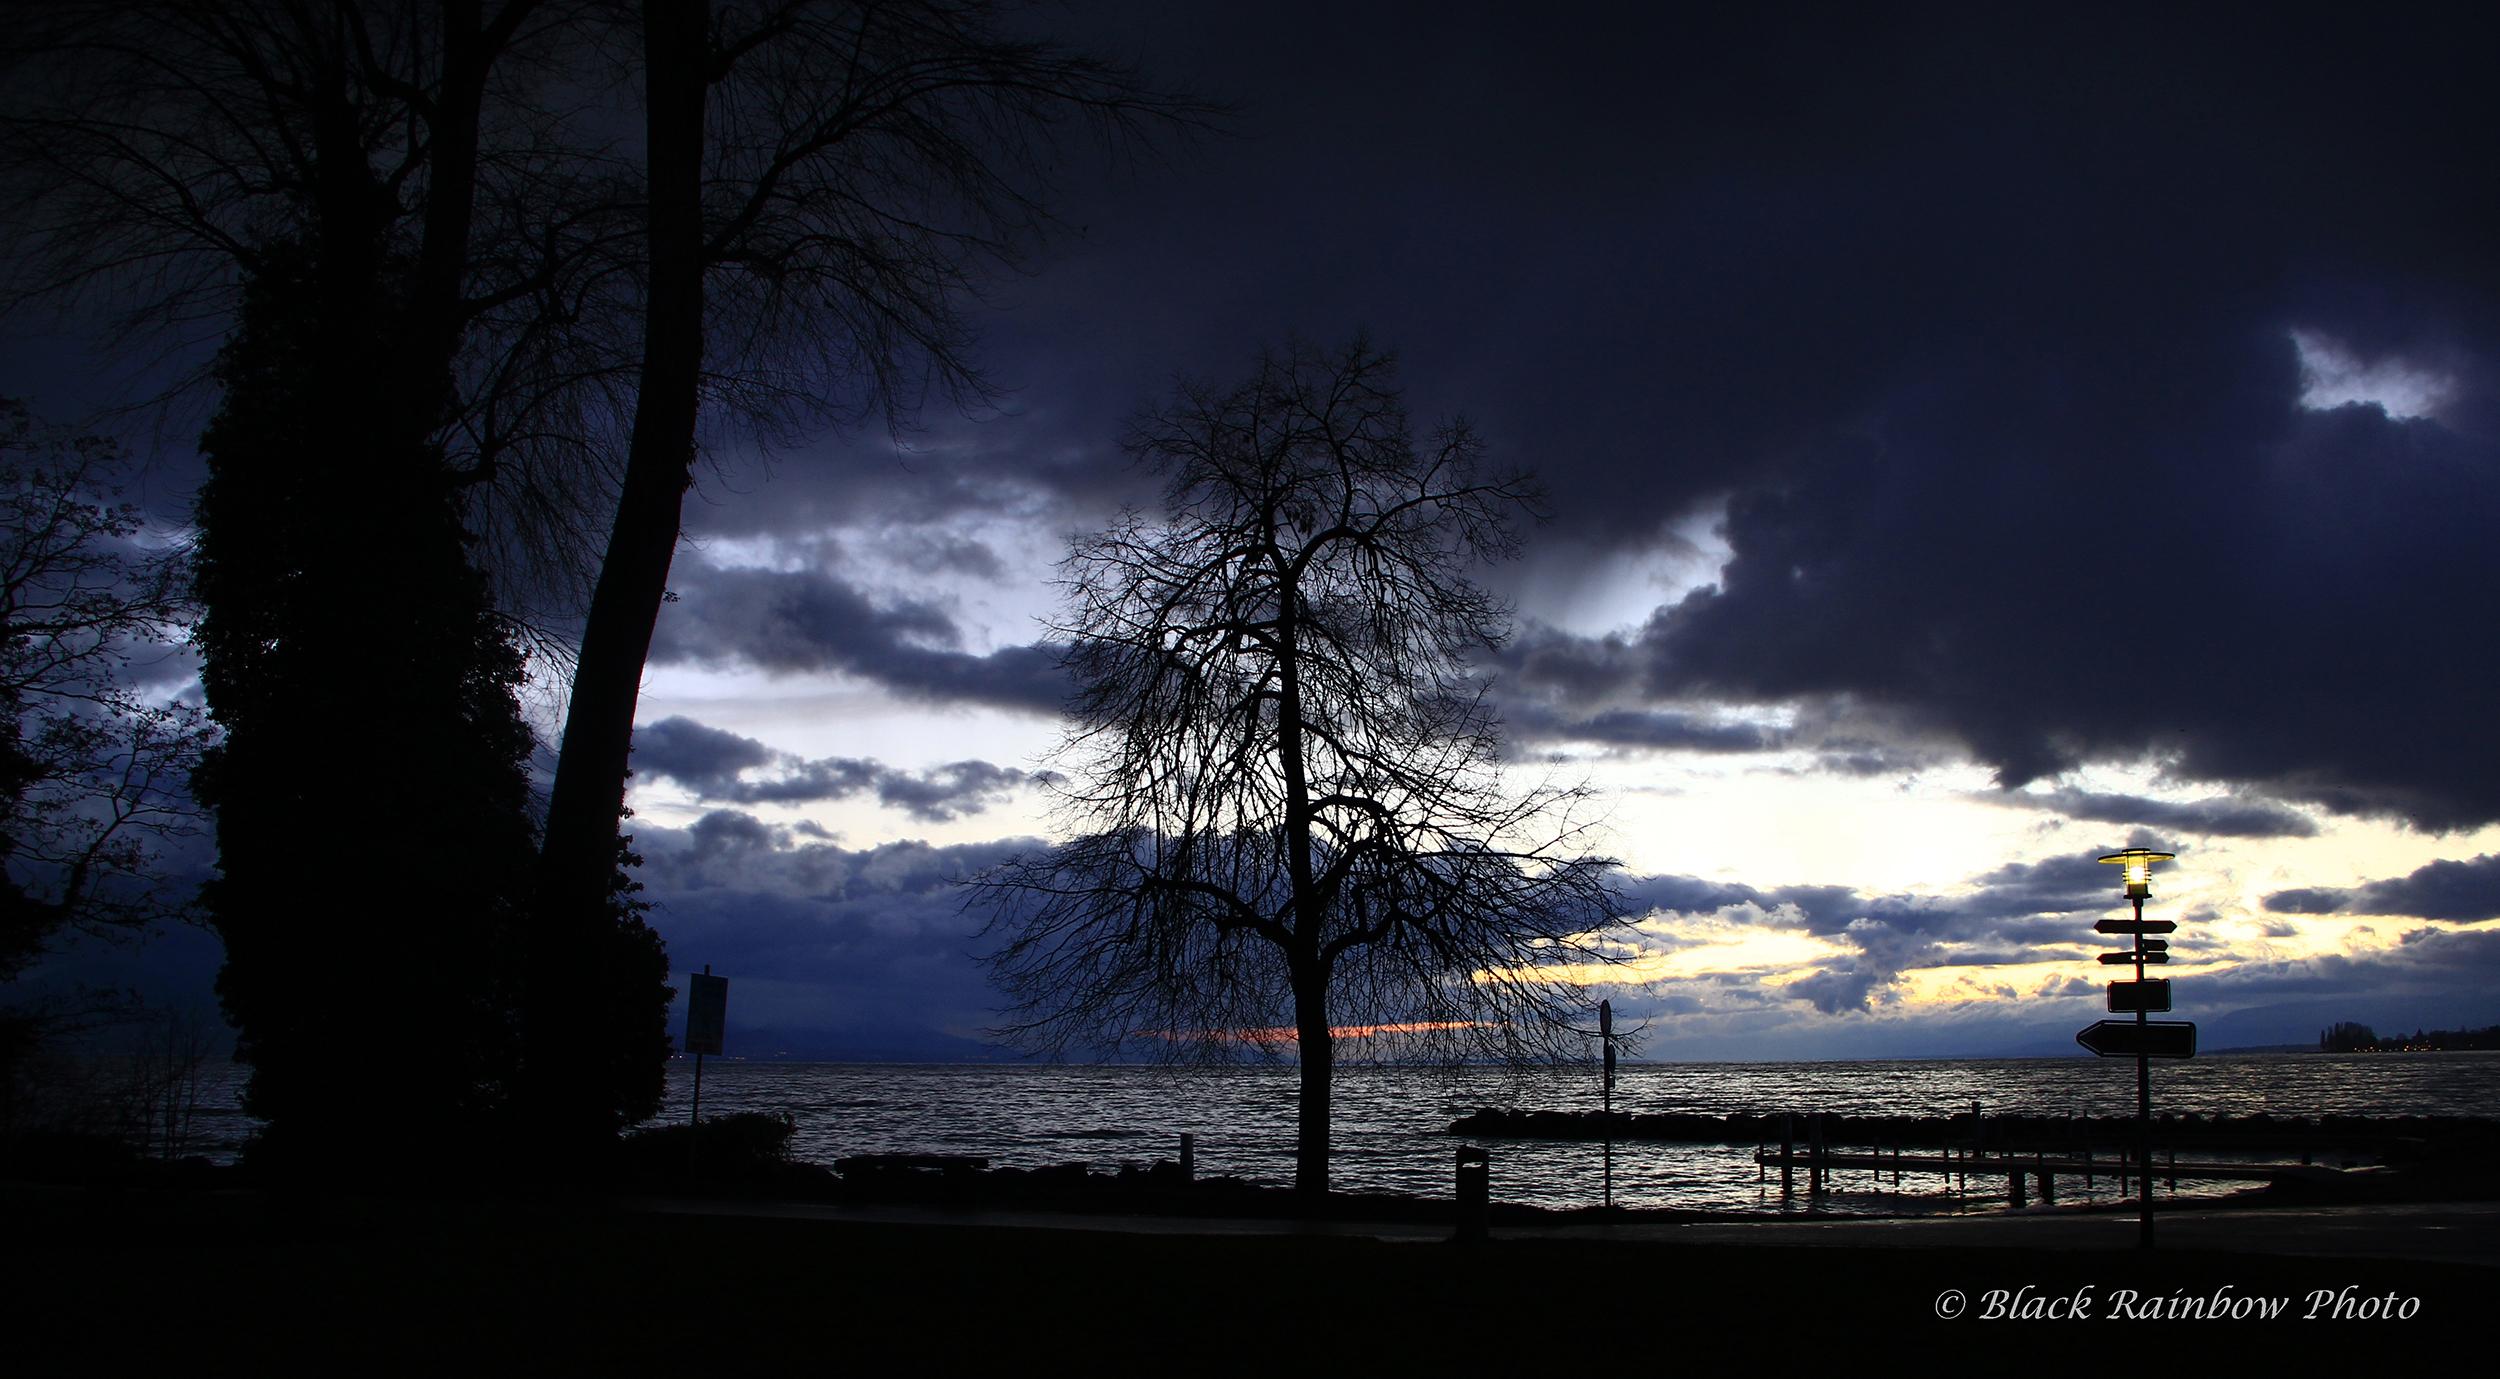 Vidy, Lausanne, 2015